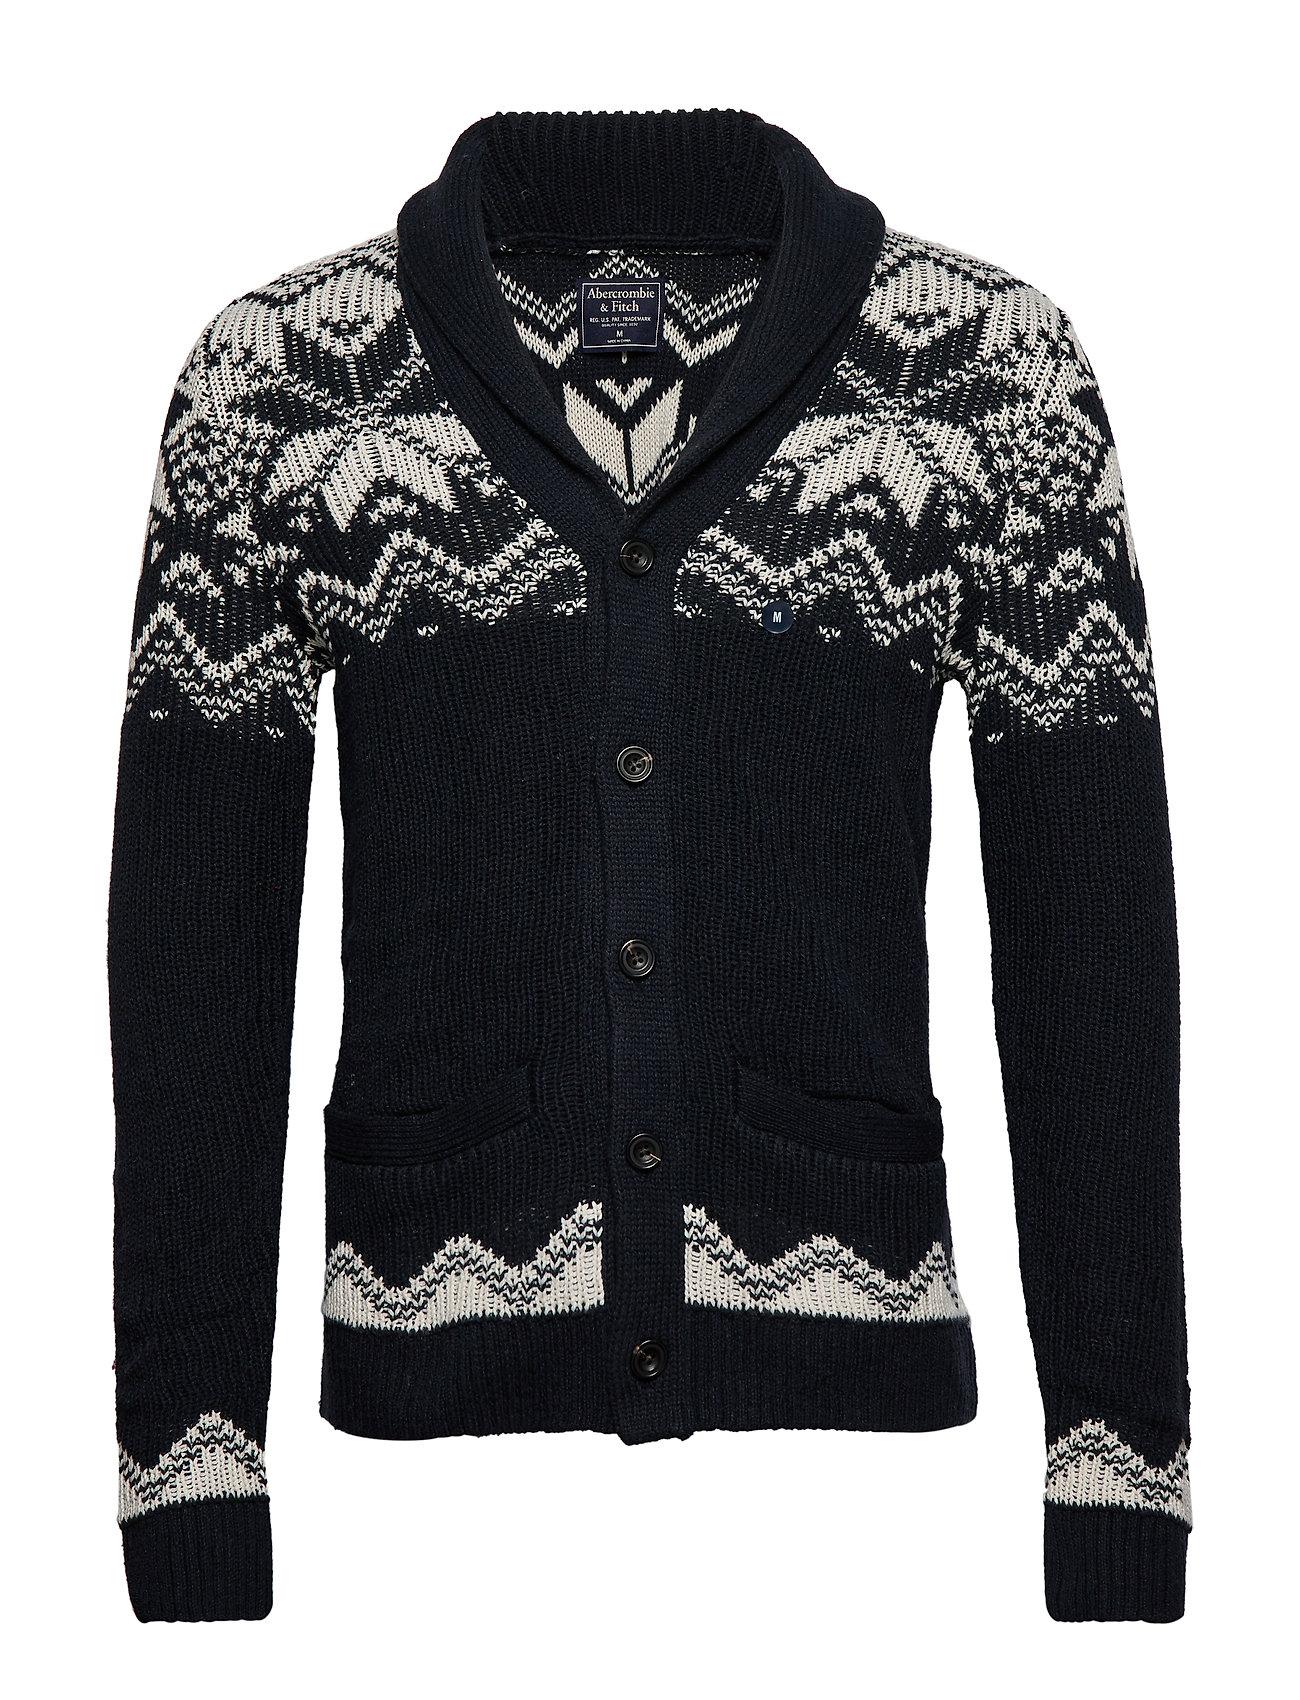 Abercrombie & Fitch Snowflake Shawl Cardigan - NAVY PATTERN